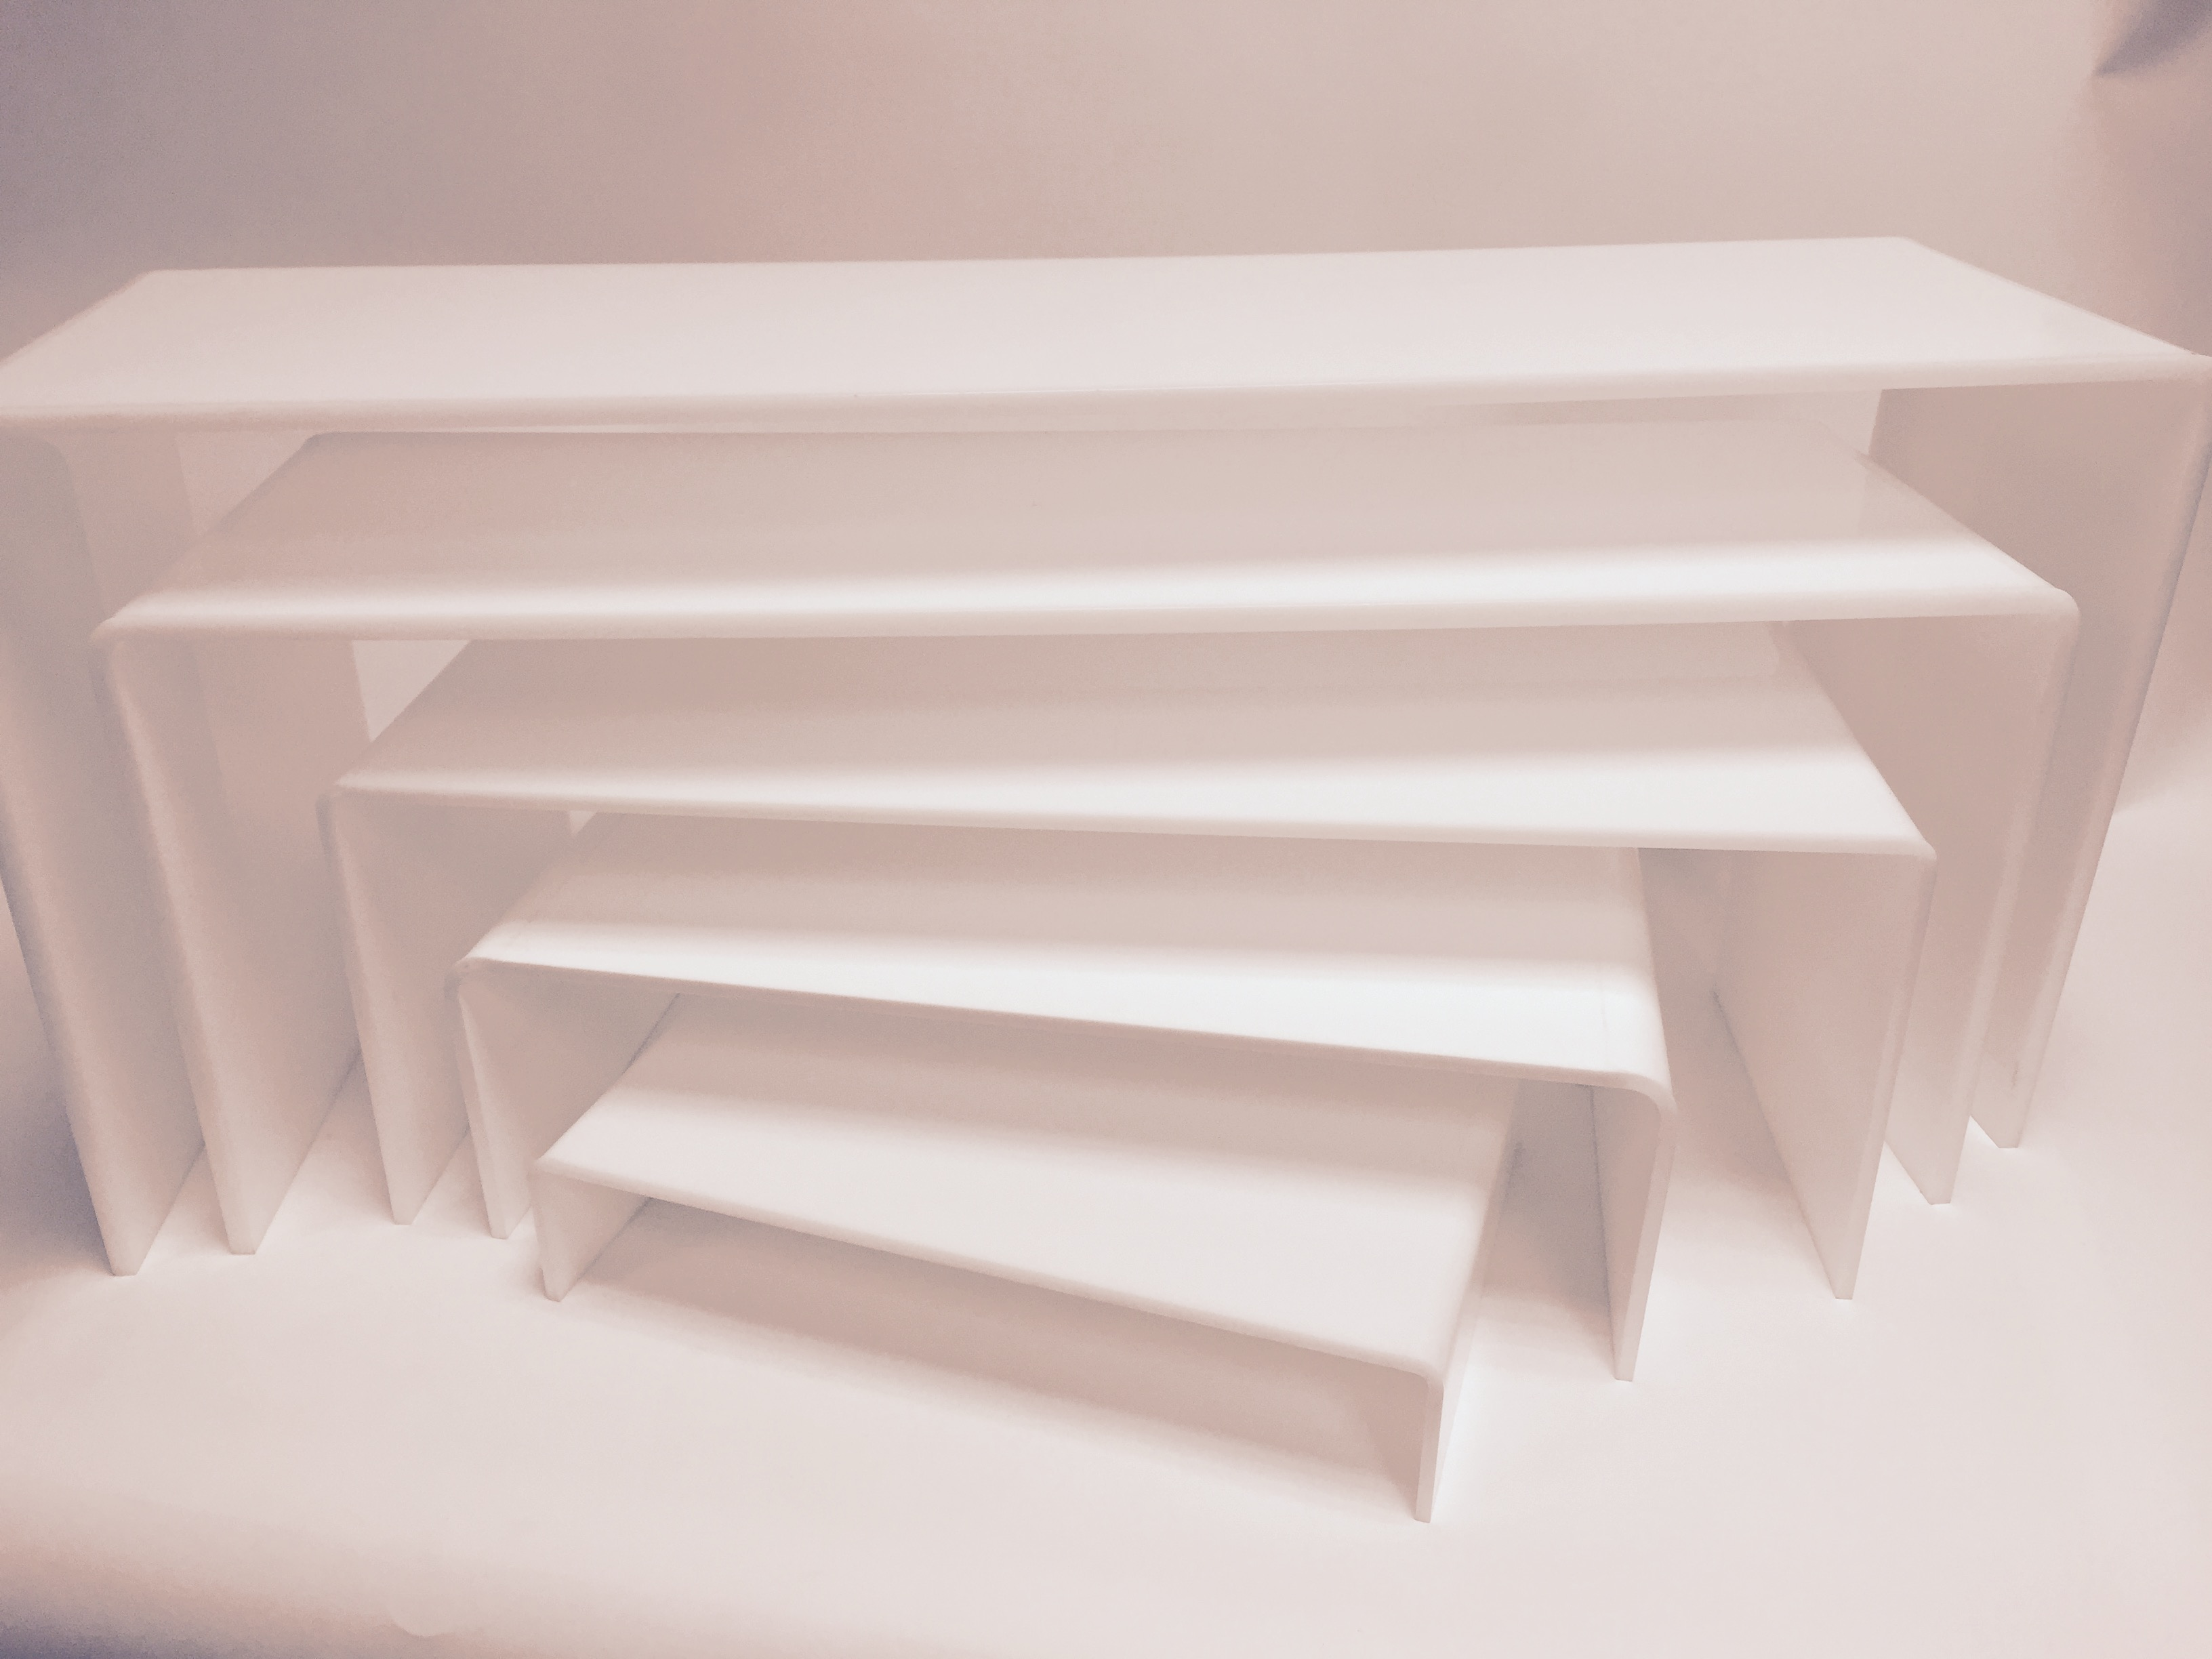 rehausses gigognes plexi blanc set de rehausses with table gigogne plexiglas. Black Bedroom Furniture Sets. Home Design Ideas